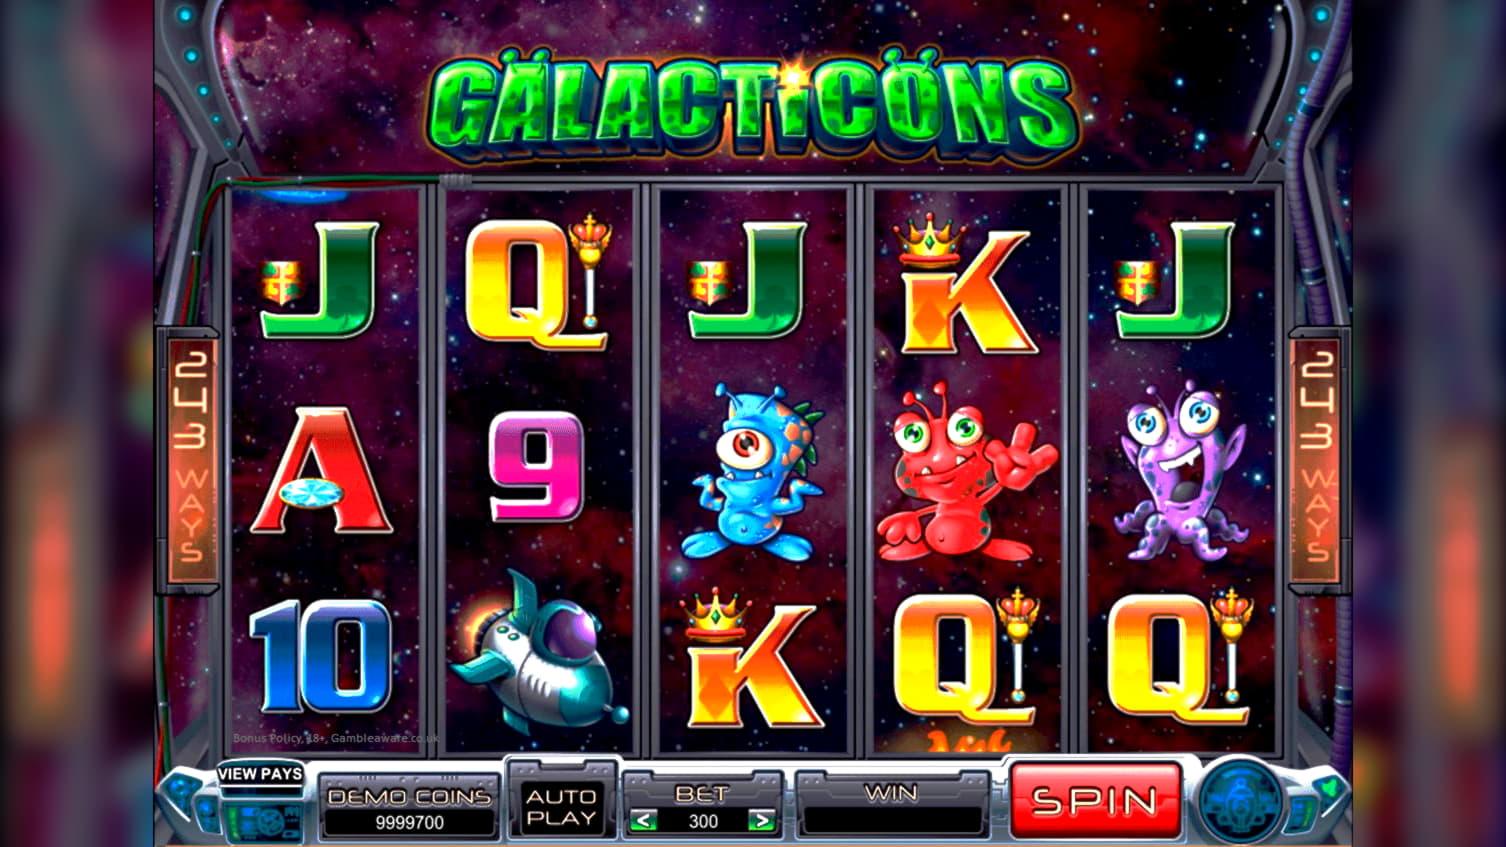 Black Lotus Casino No Deposit Bonus 2020